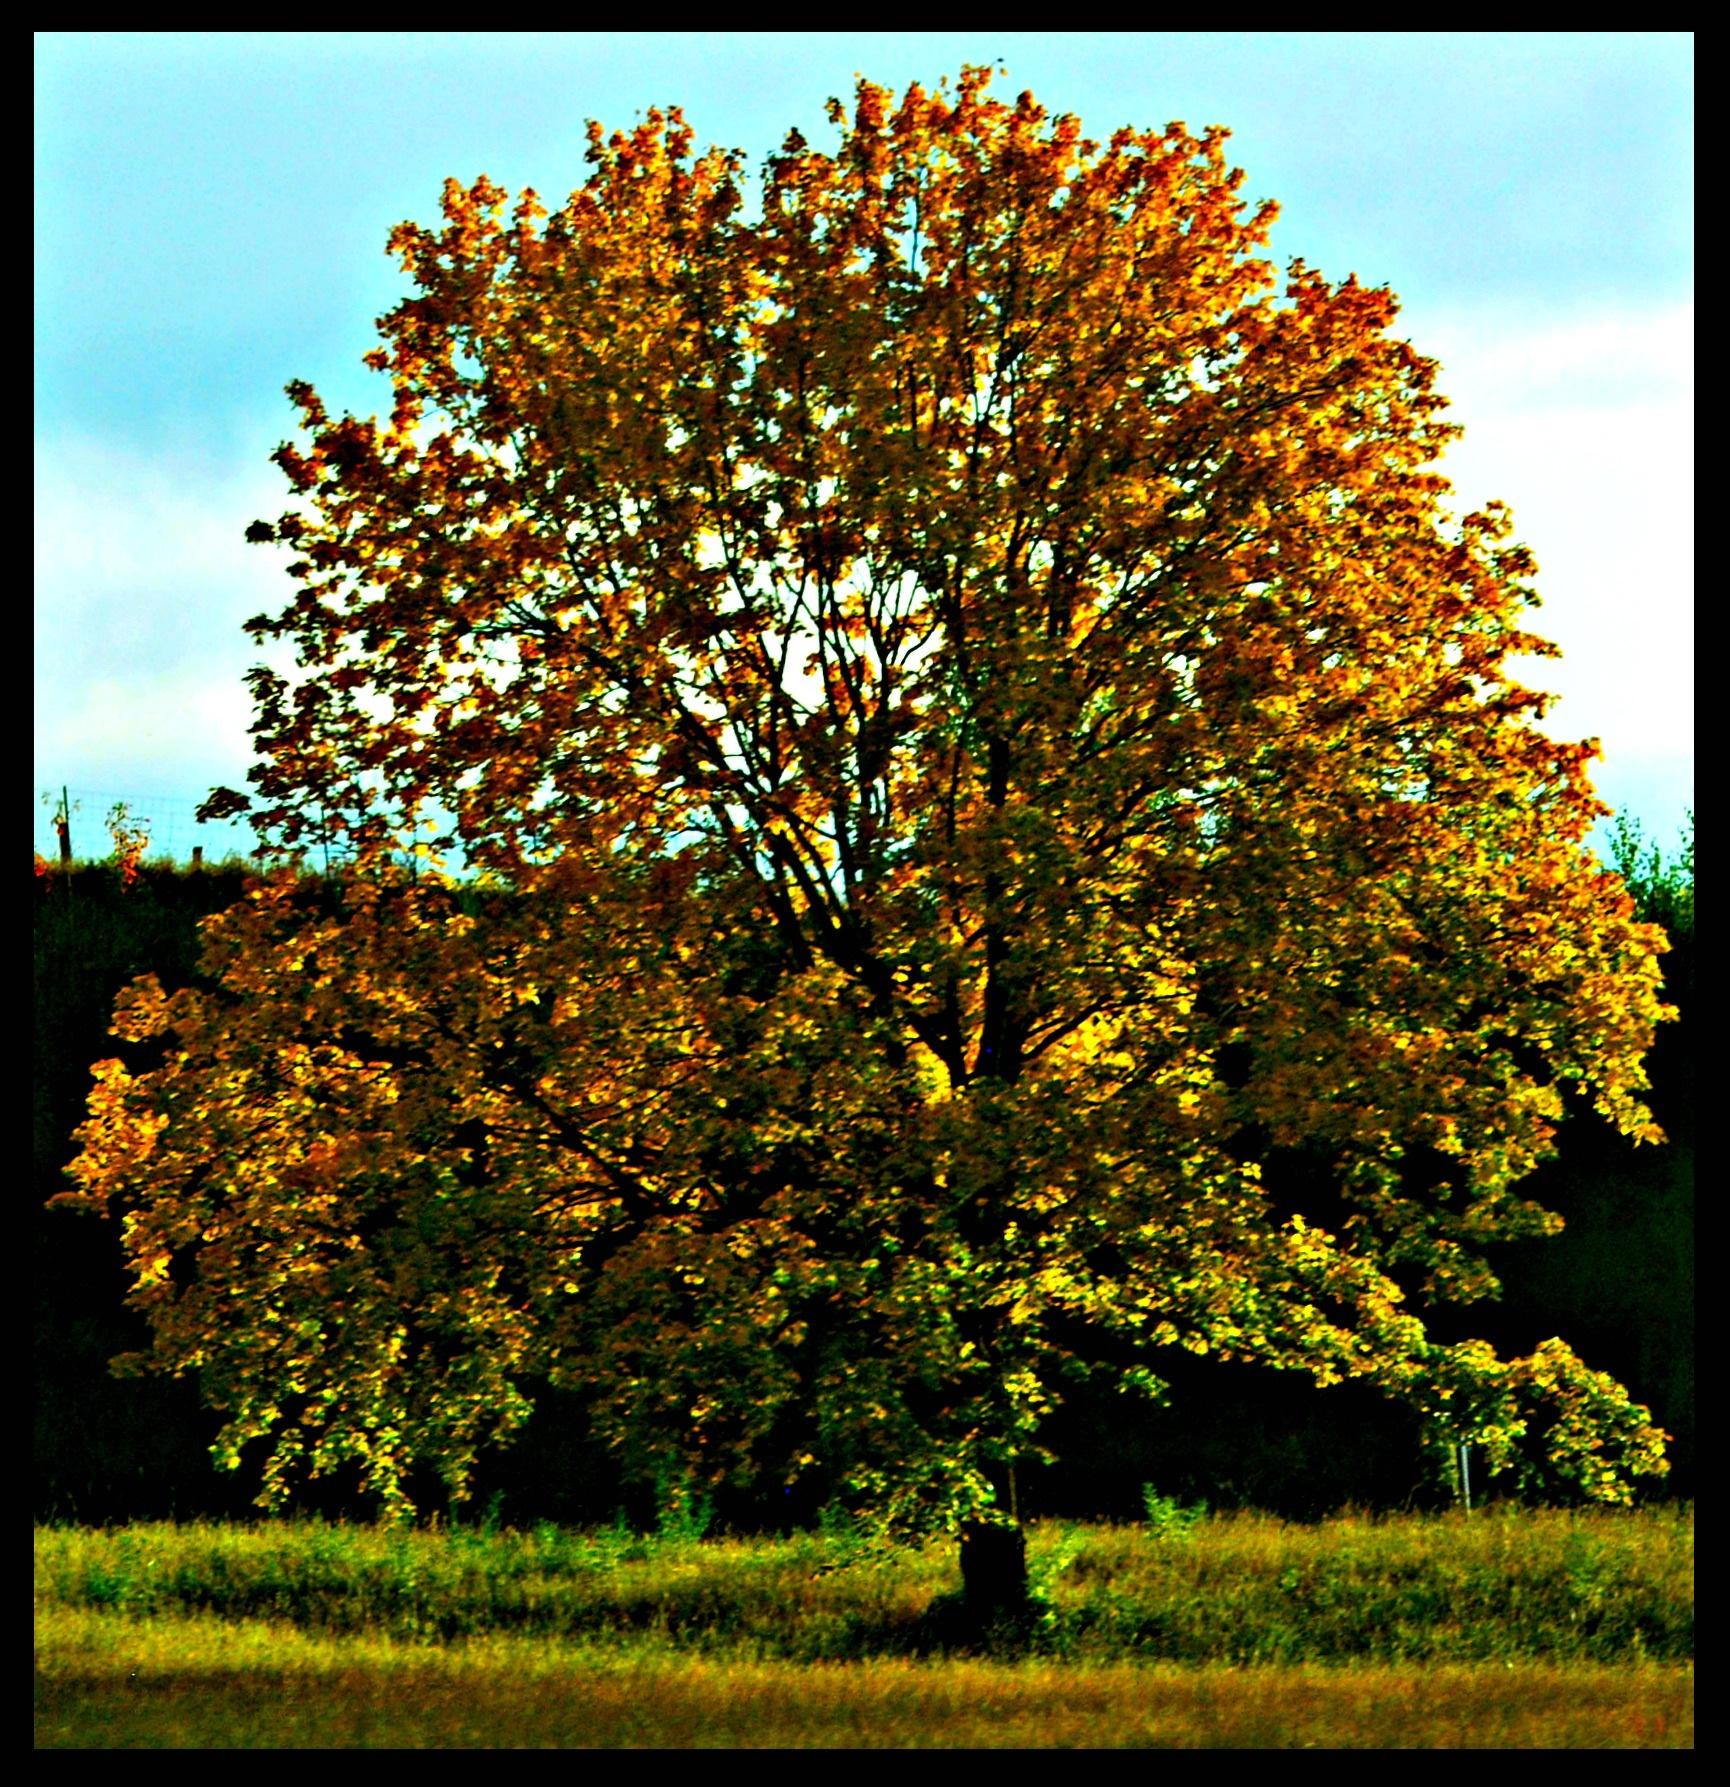 the tree by Marija Petrovic